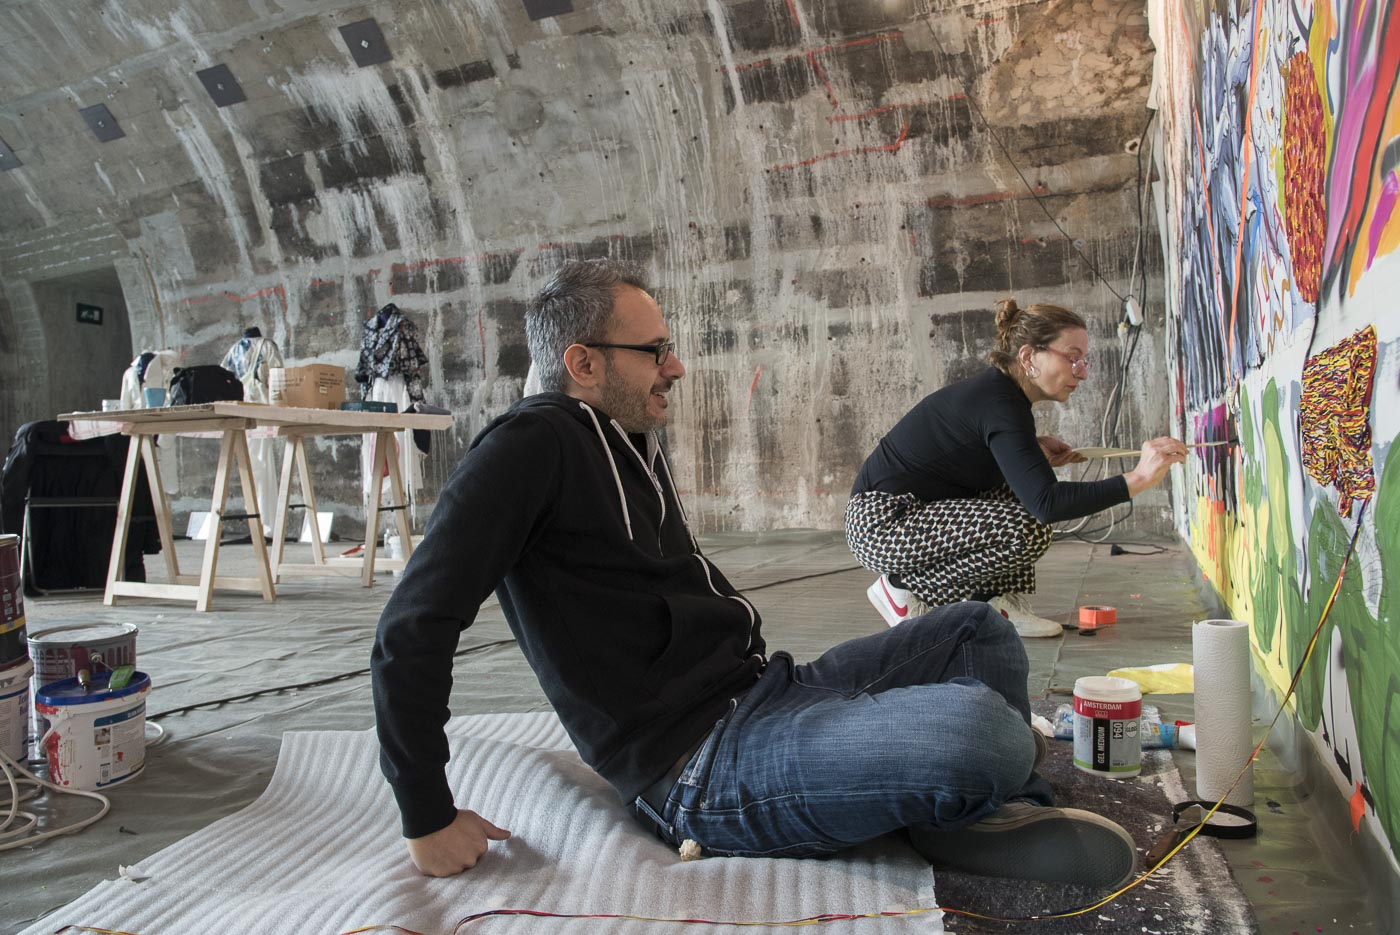 Ein ganz normaler Herbst, nur anders- Projekt KVFM- Claudia Weber, Martina Gebhardt und Serkan Goeren  -Tag 21